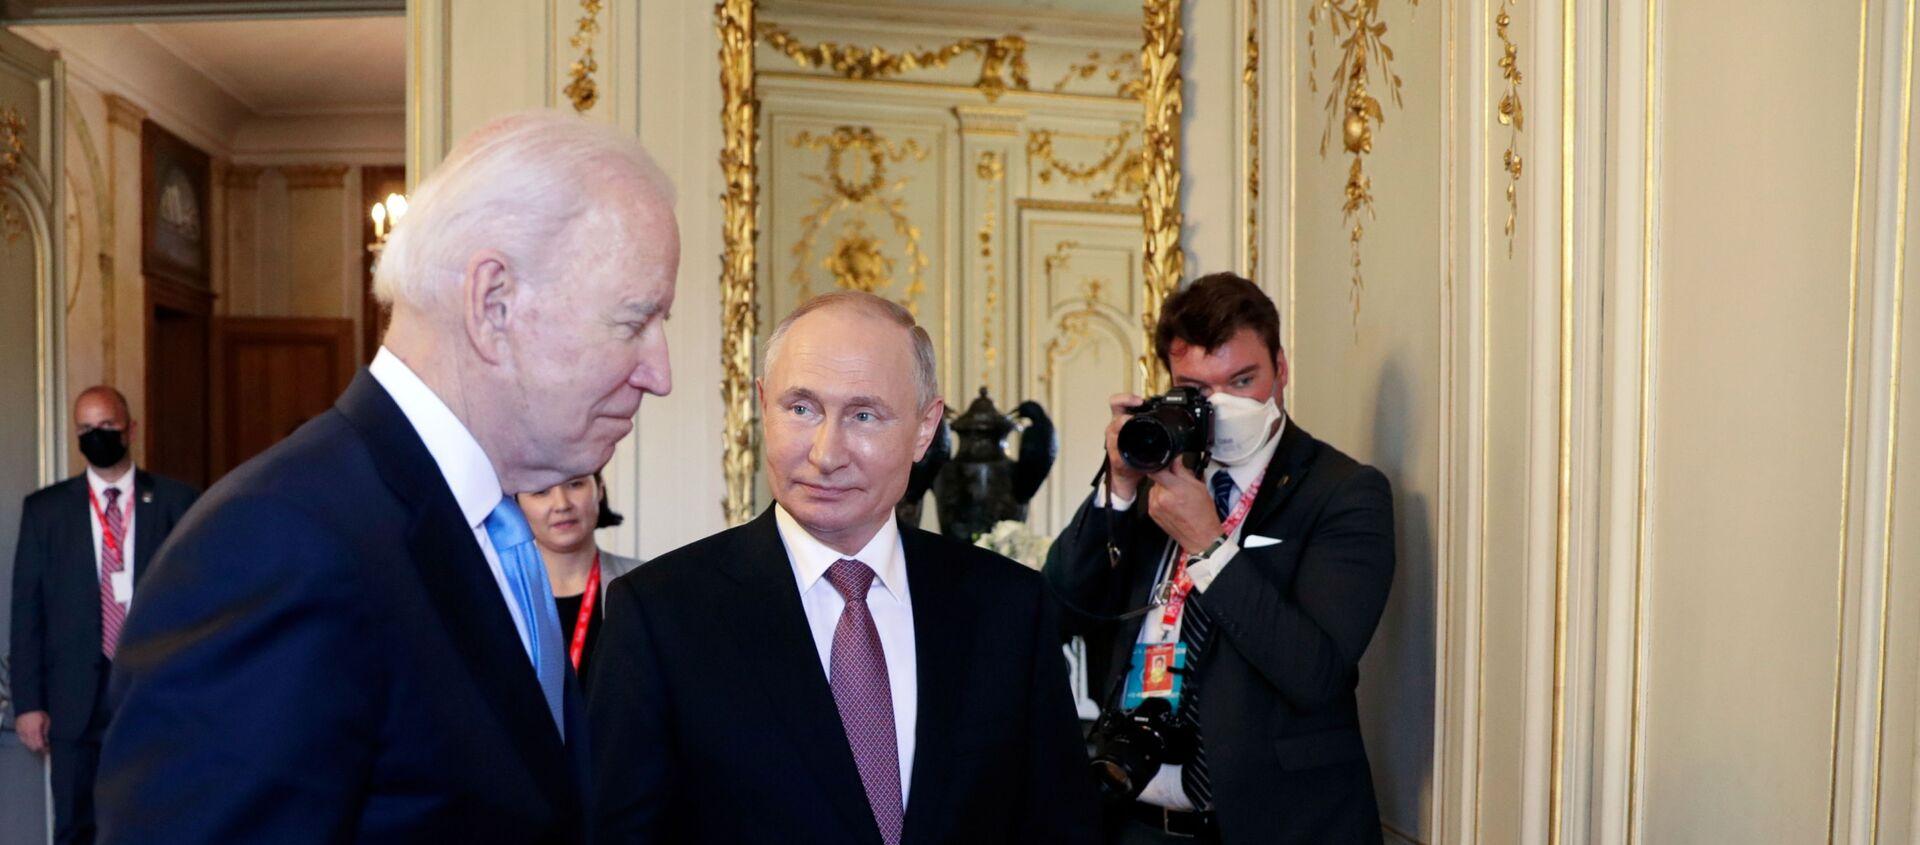 U.S. President Joe Biden and Russia's President Vladimir Putin meet for the U.S.-Russia summit at Villa La Grange in Geneva, Switzerland  - Sputnik International, 1920, 21.07.2021